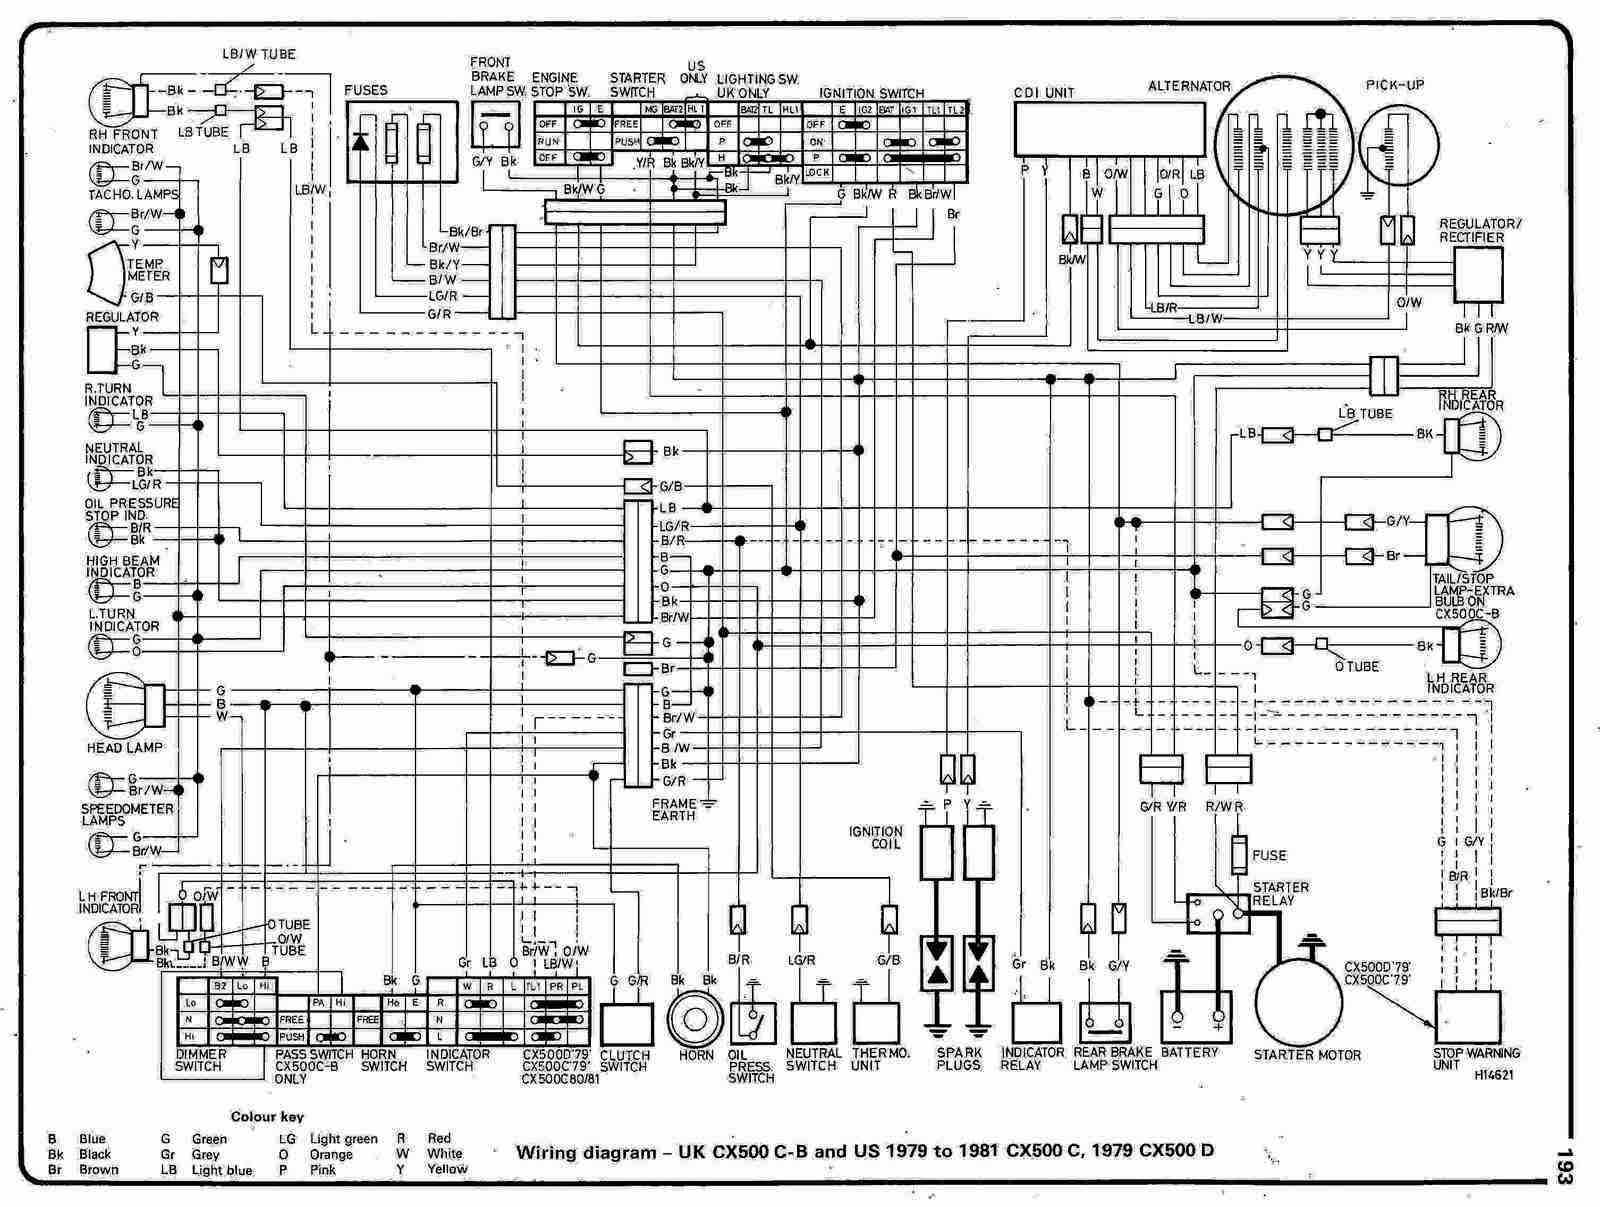 Fancy Honda Gx630 Wiring Diagram Component Electrical Diagram